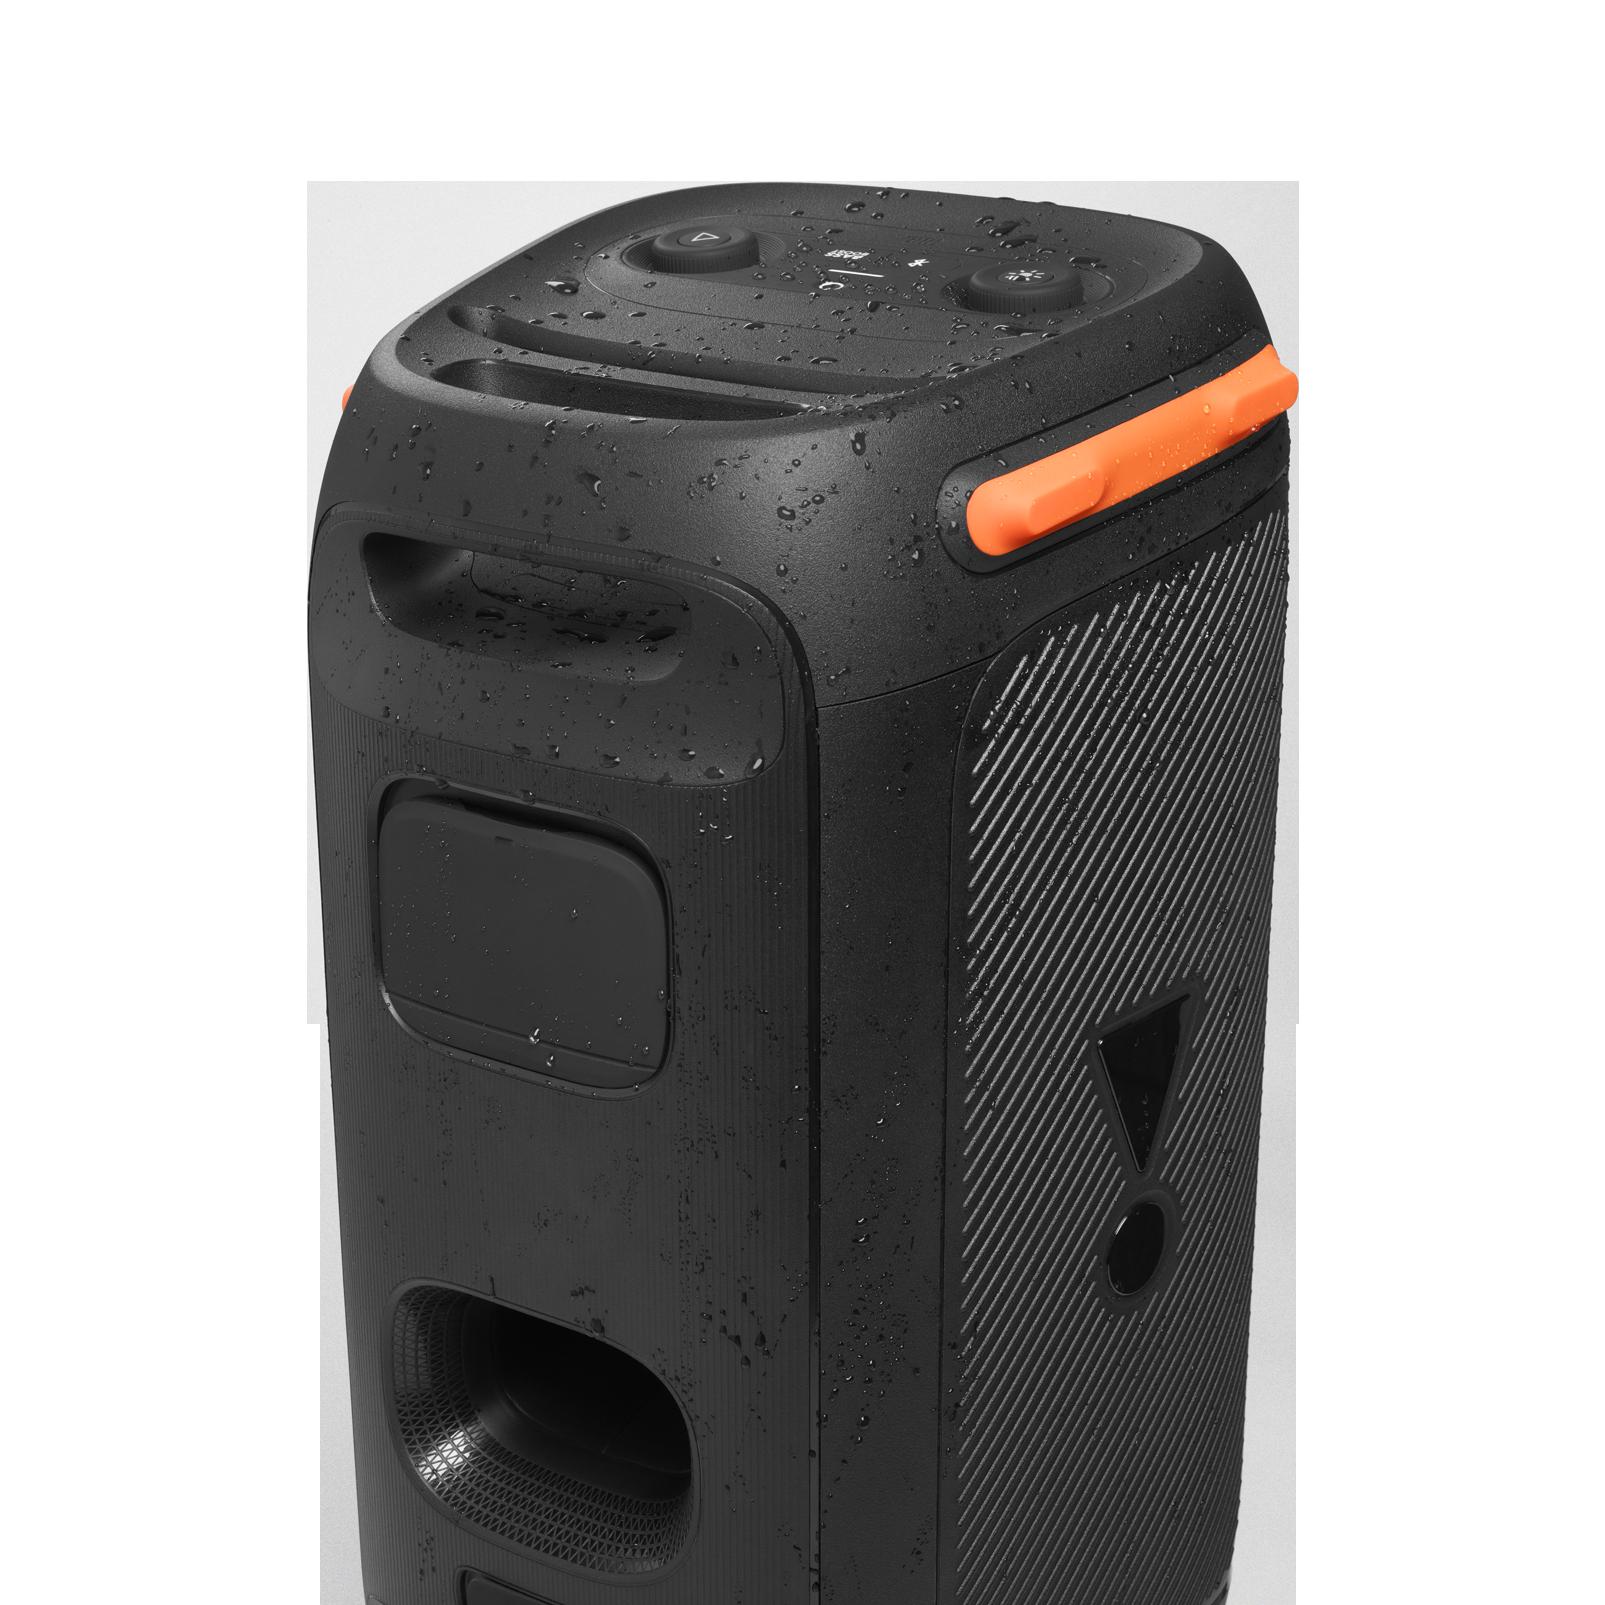 JBL Partybox 110 - Black - Portable party speaker with 160W powerful sound, built-in lights and splashproof design. - Detailshot 6